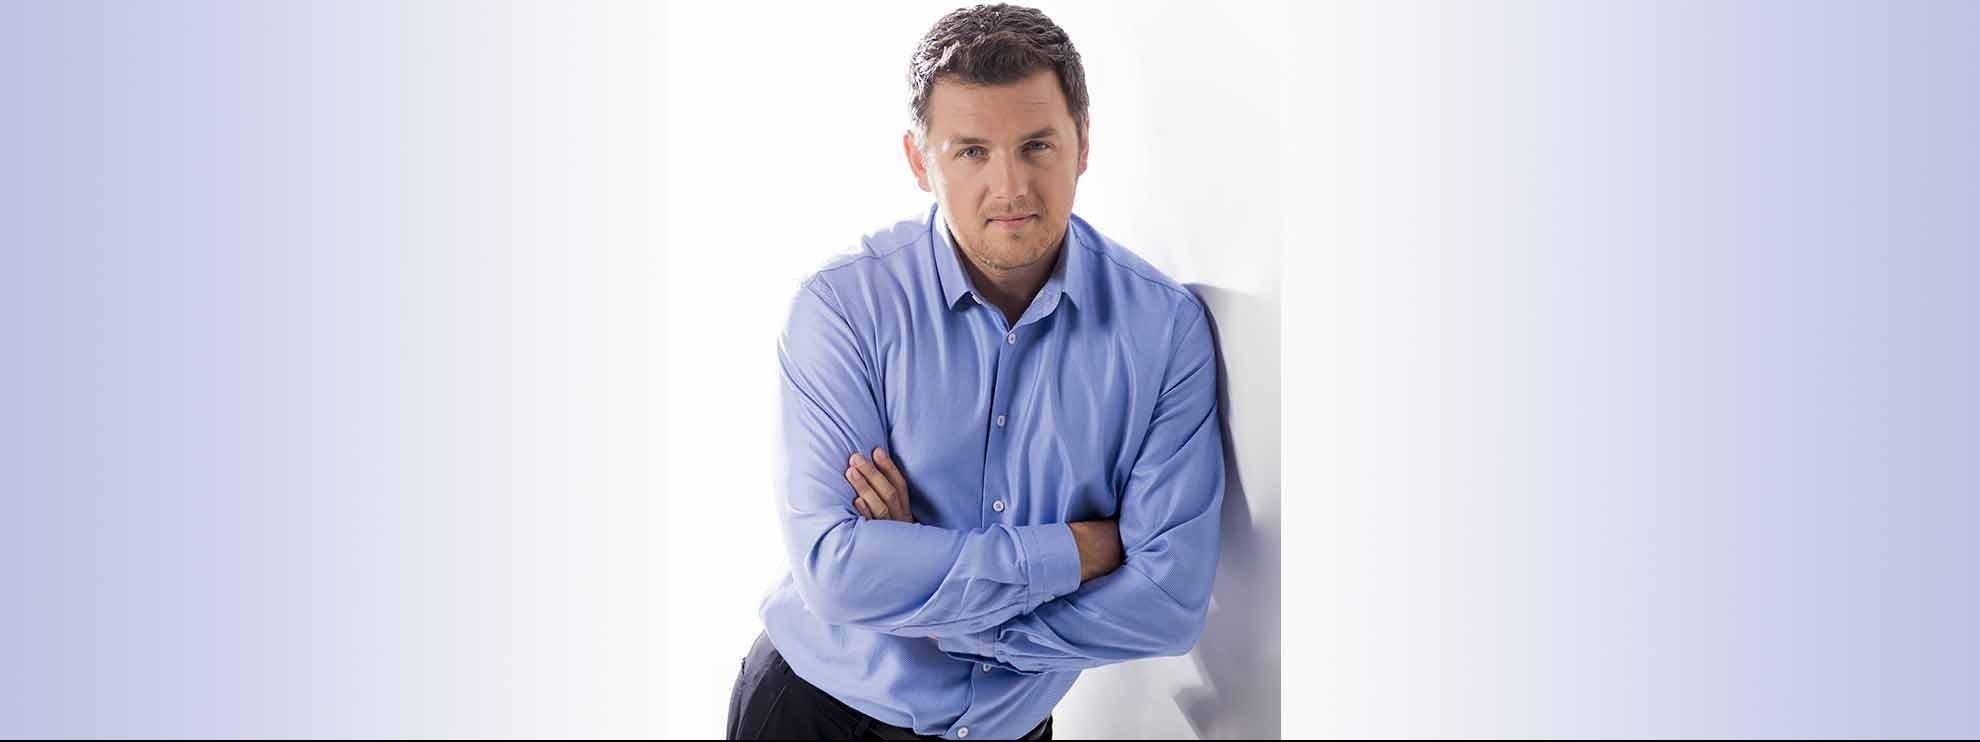 Dmitry Karpachev - known psychologist and TV host